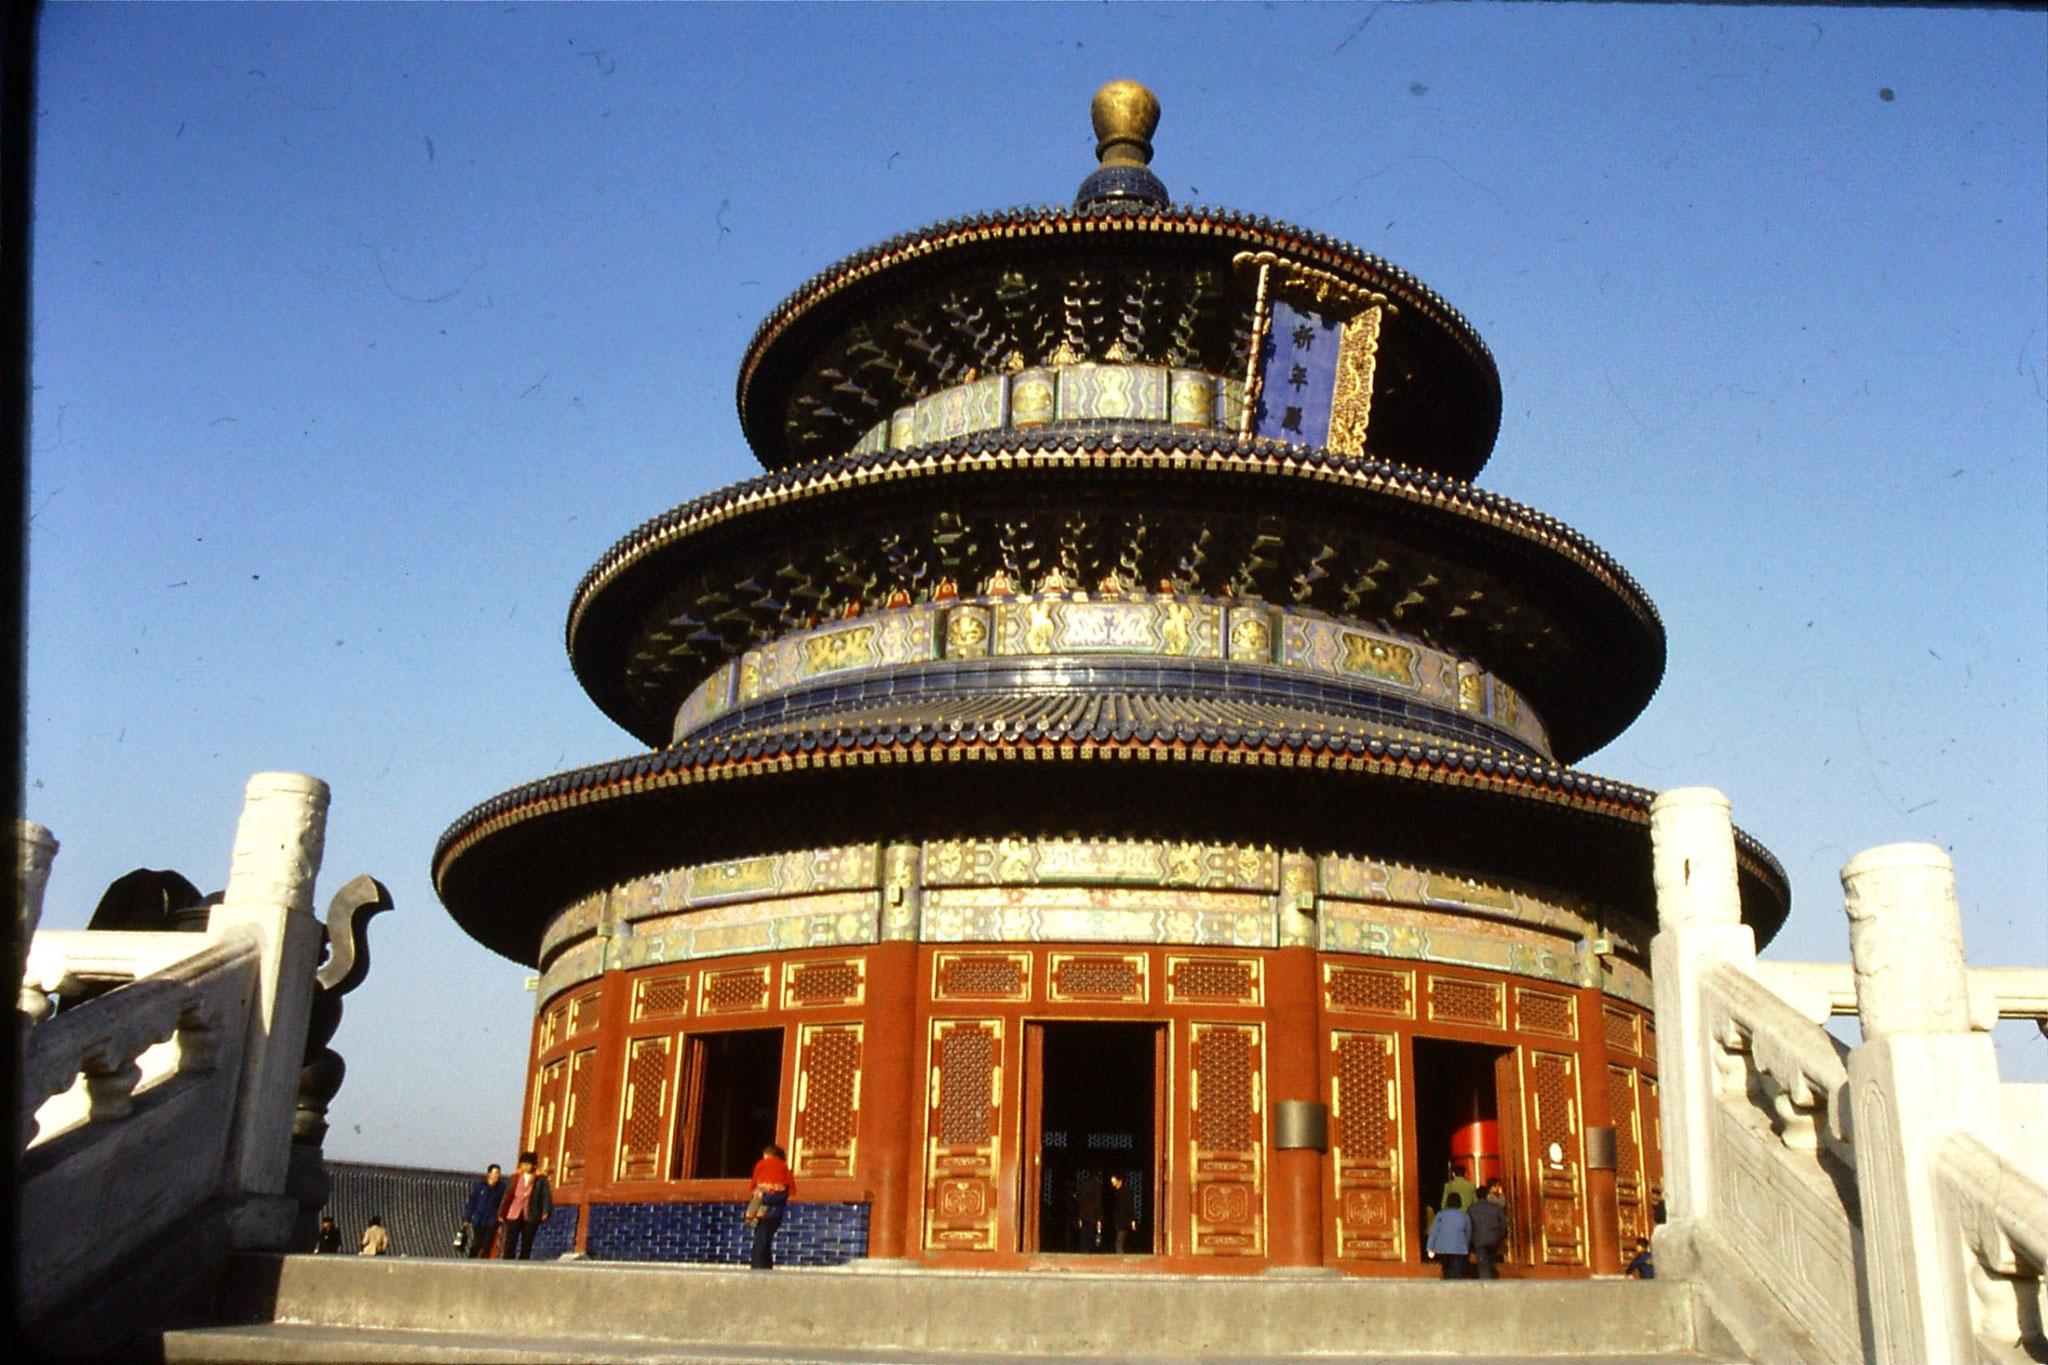 2/12/1988: 23: Tiantan Park